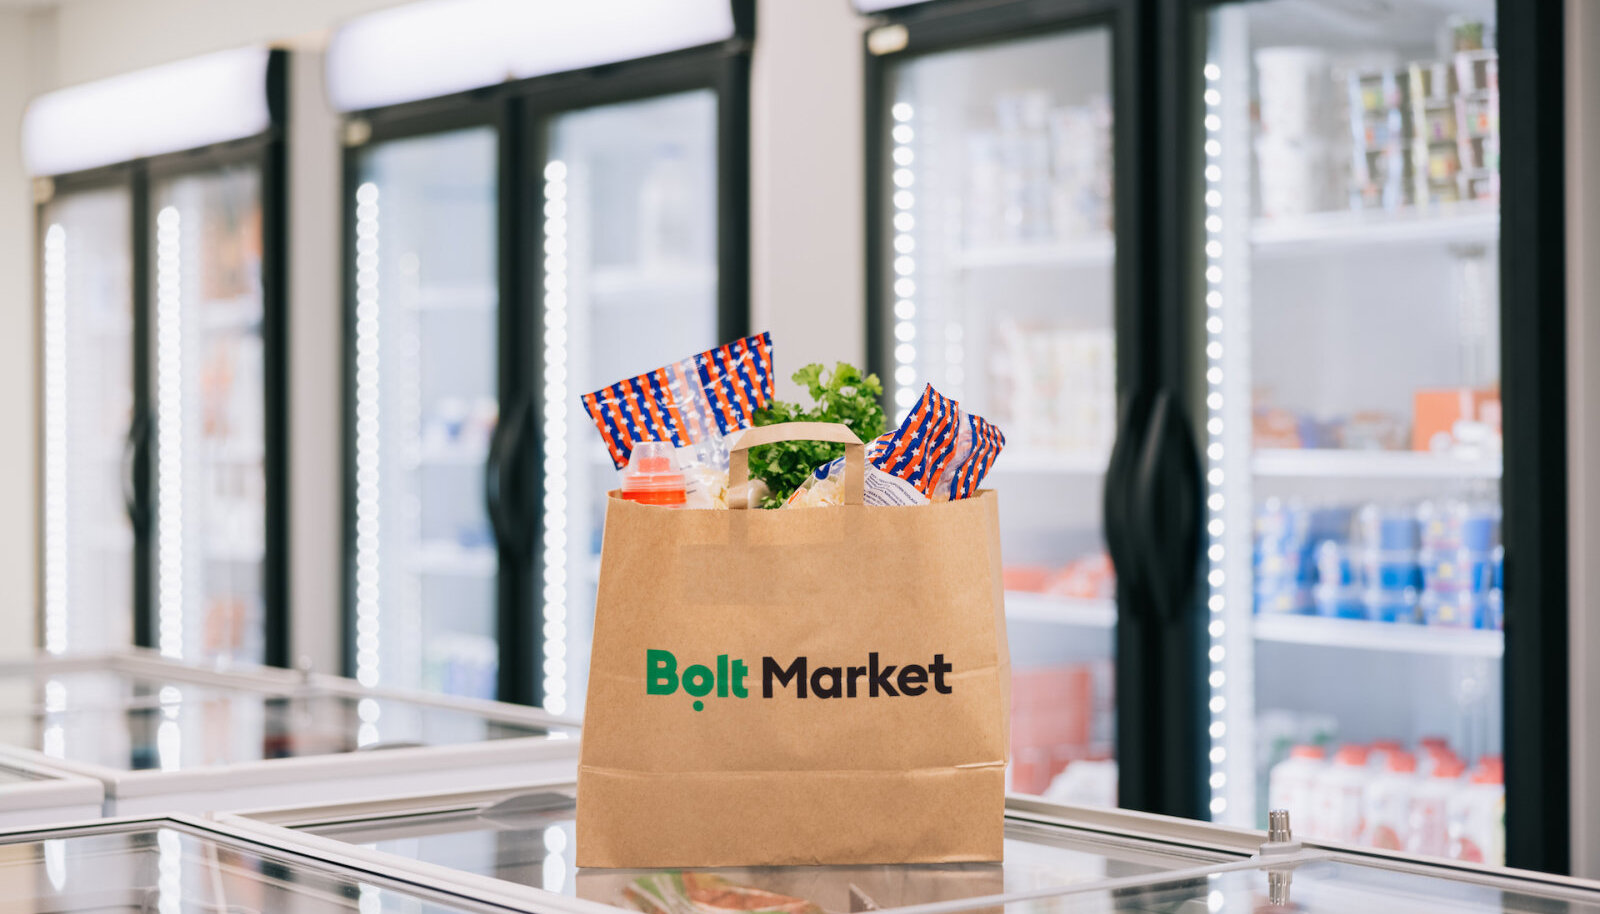 Bolt Market